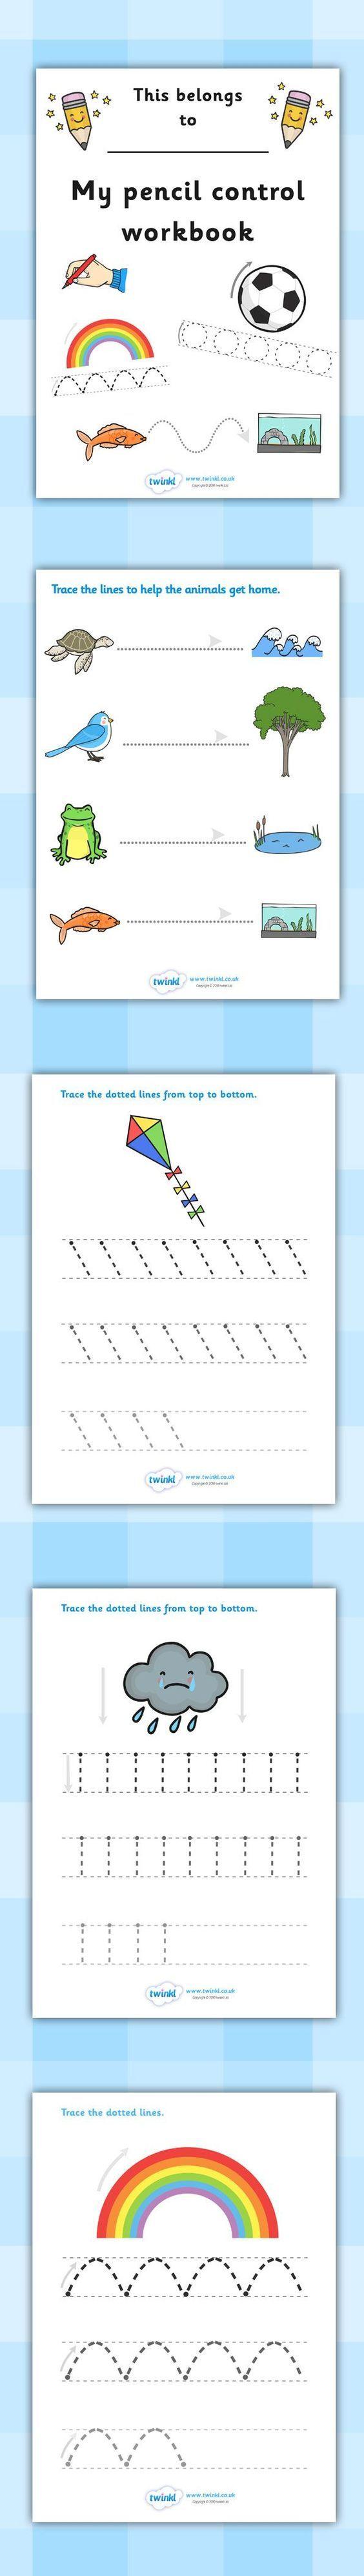 15++ Handwriting worksheets twinkl Images